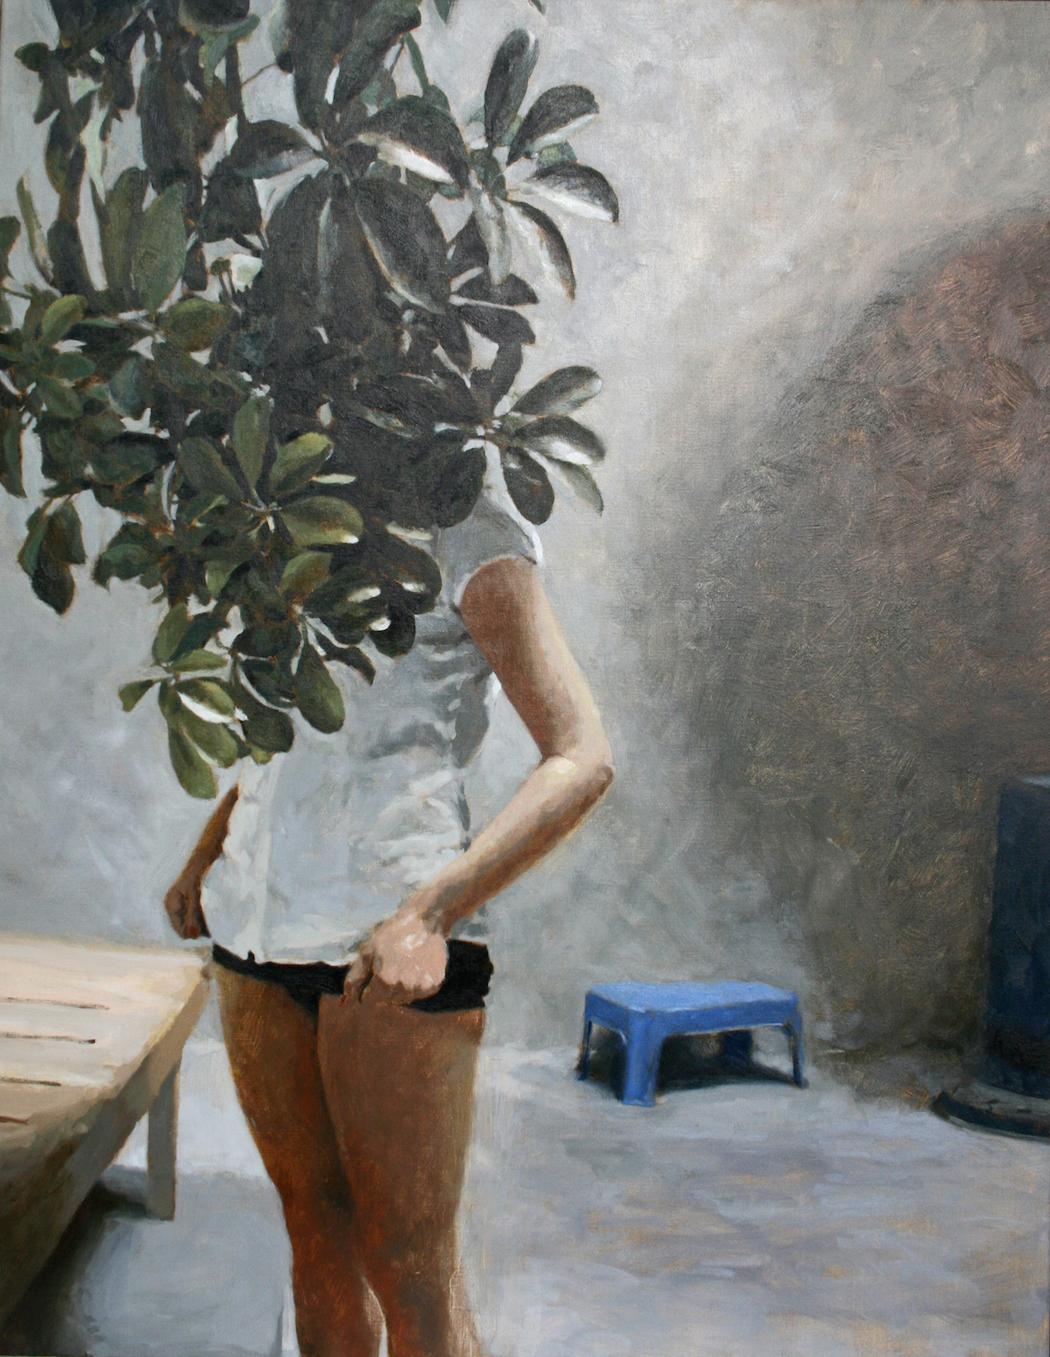 Rafel Bestard_Mujer con planta_edited-1